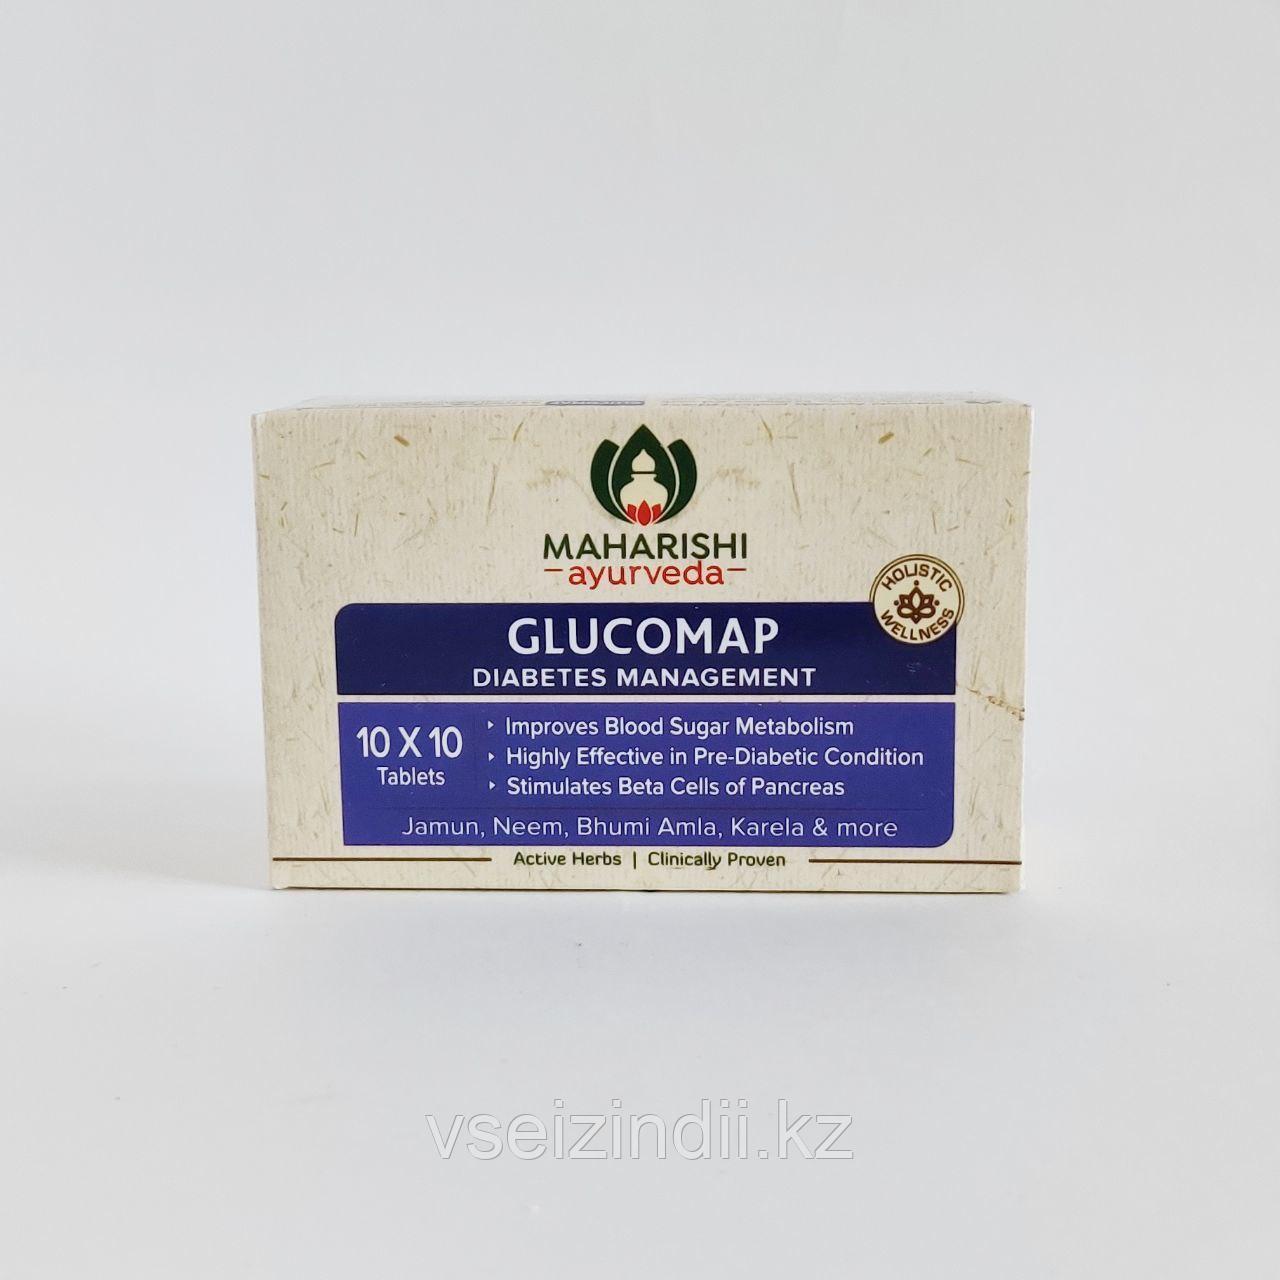 Глюкомап, Махариши Аюрведа (Glucomap, Maharishi Ayurveda). Понижает уровень сахара, 100 табл.